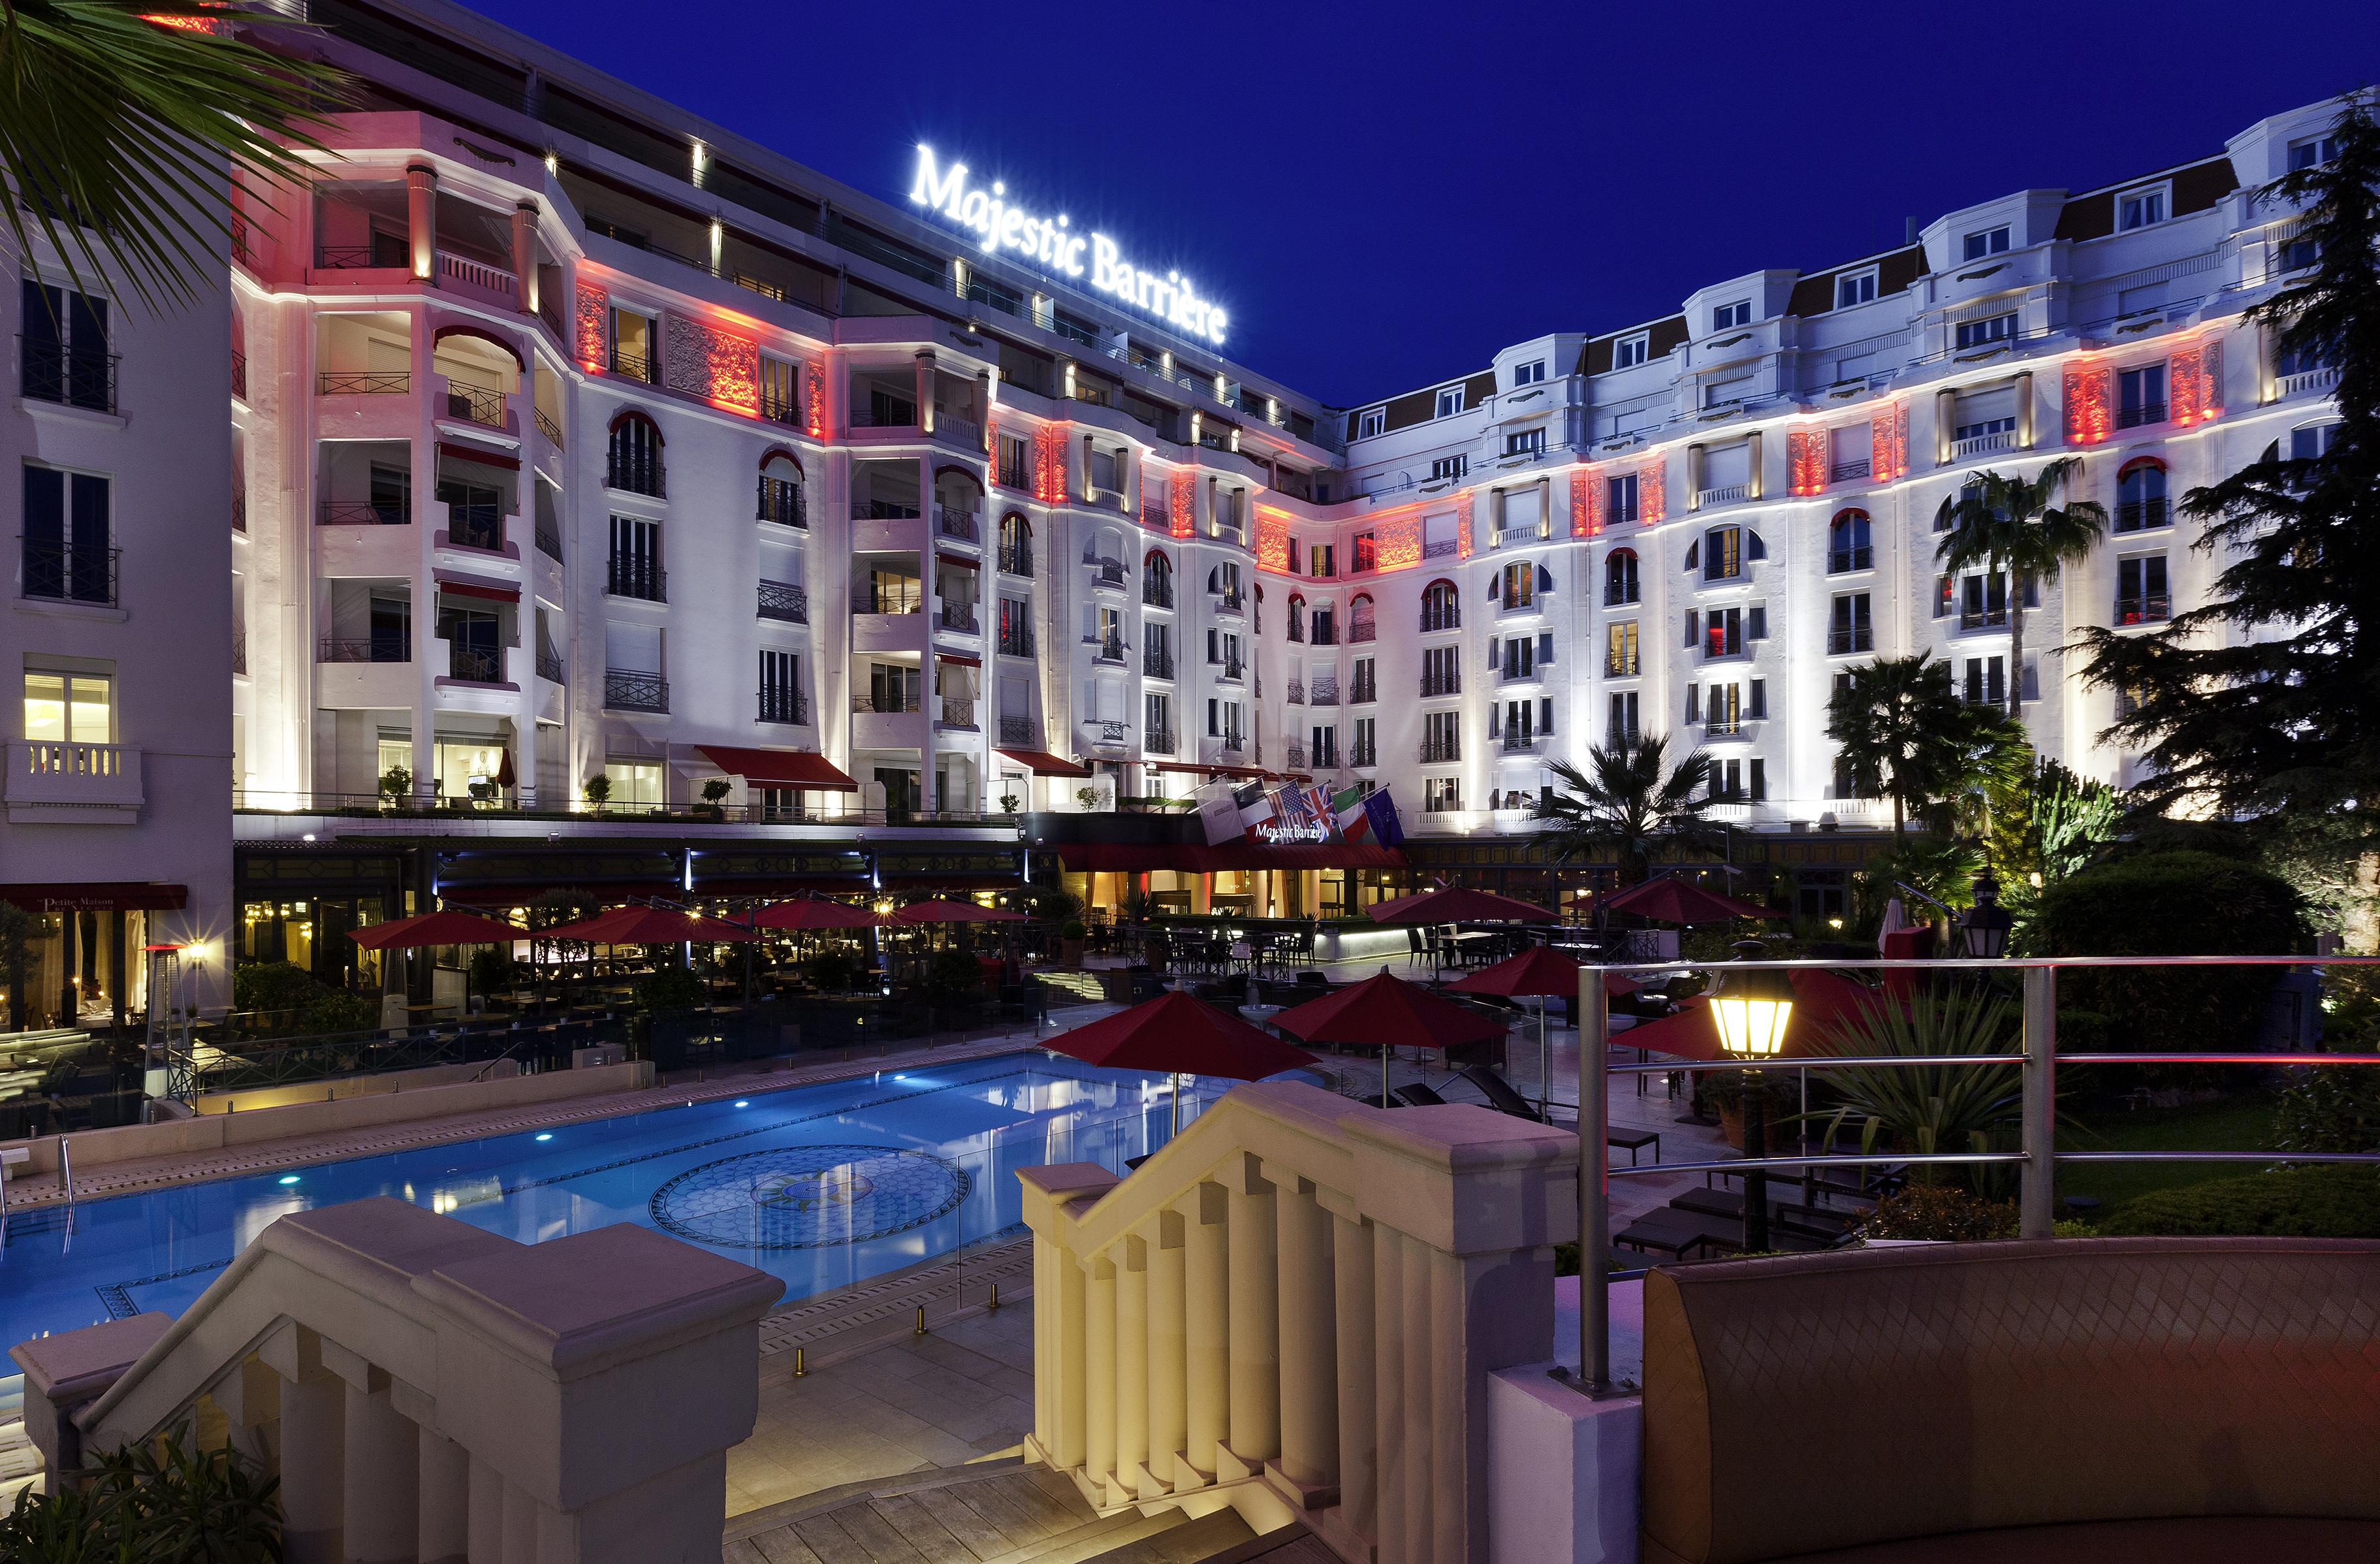 Les h tels majestic barri re et gray d albion barri re for Hotels barriere